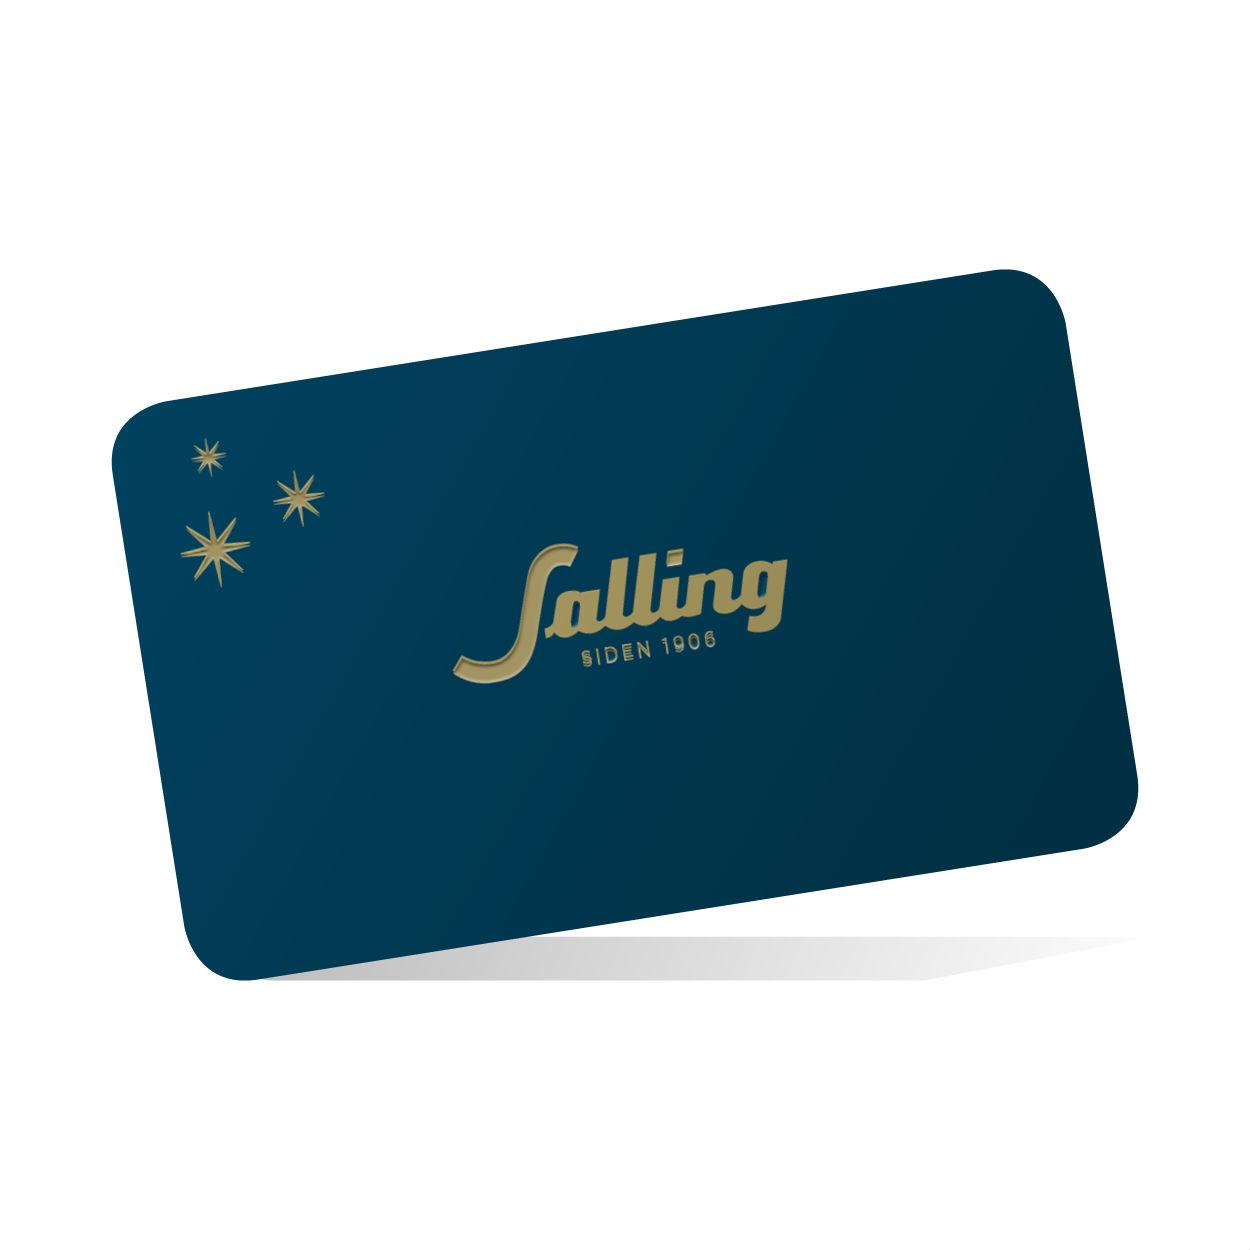 Salling gavekort - 750 kr